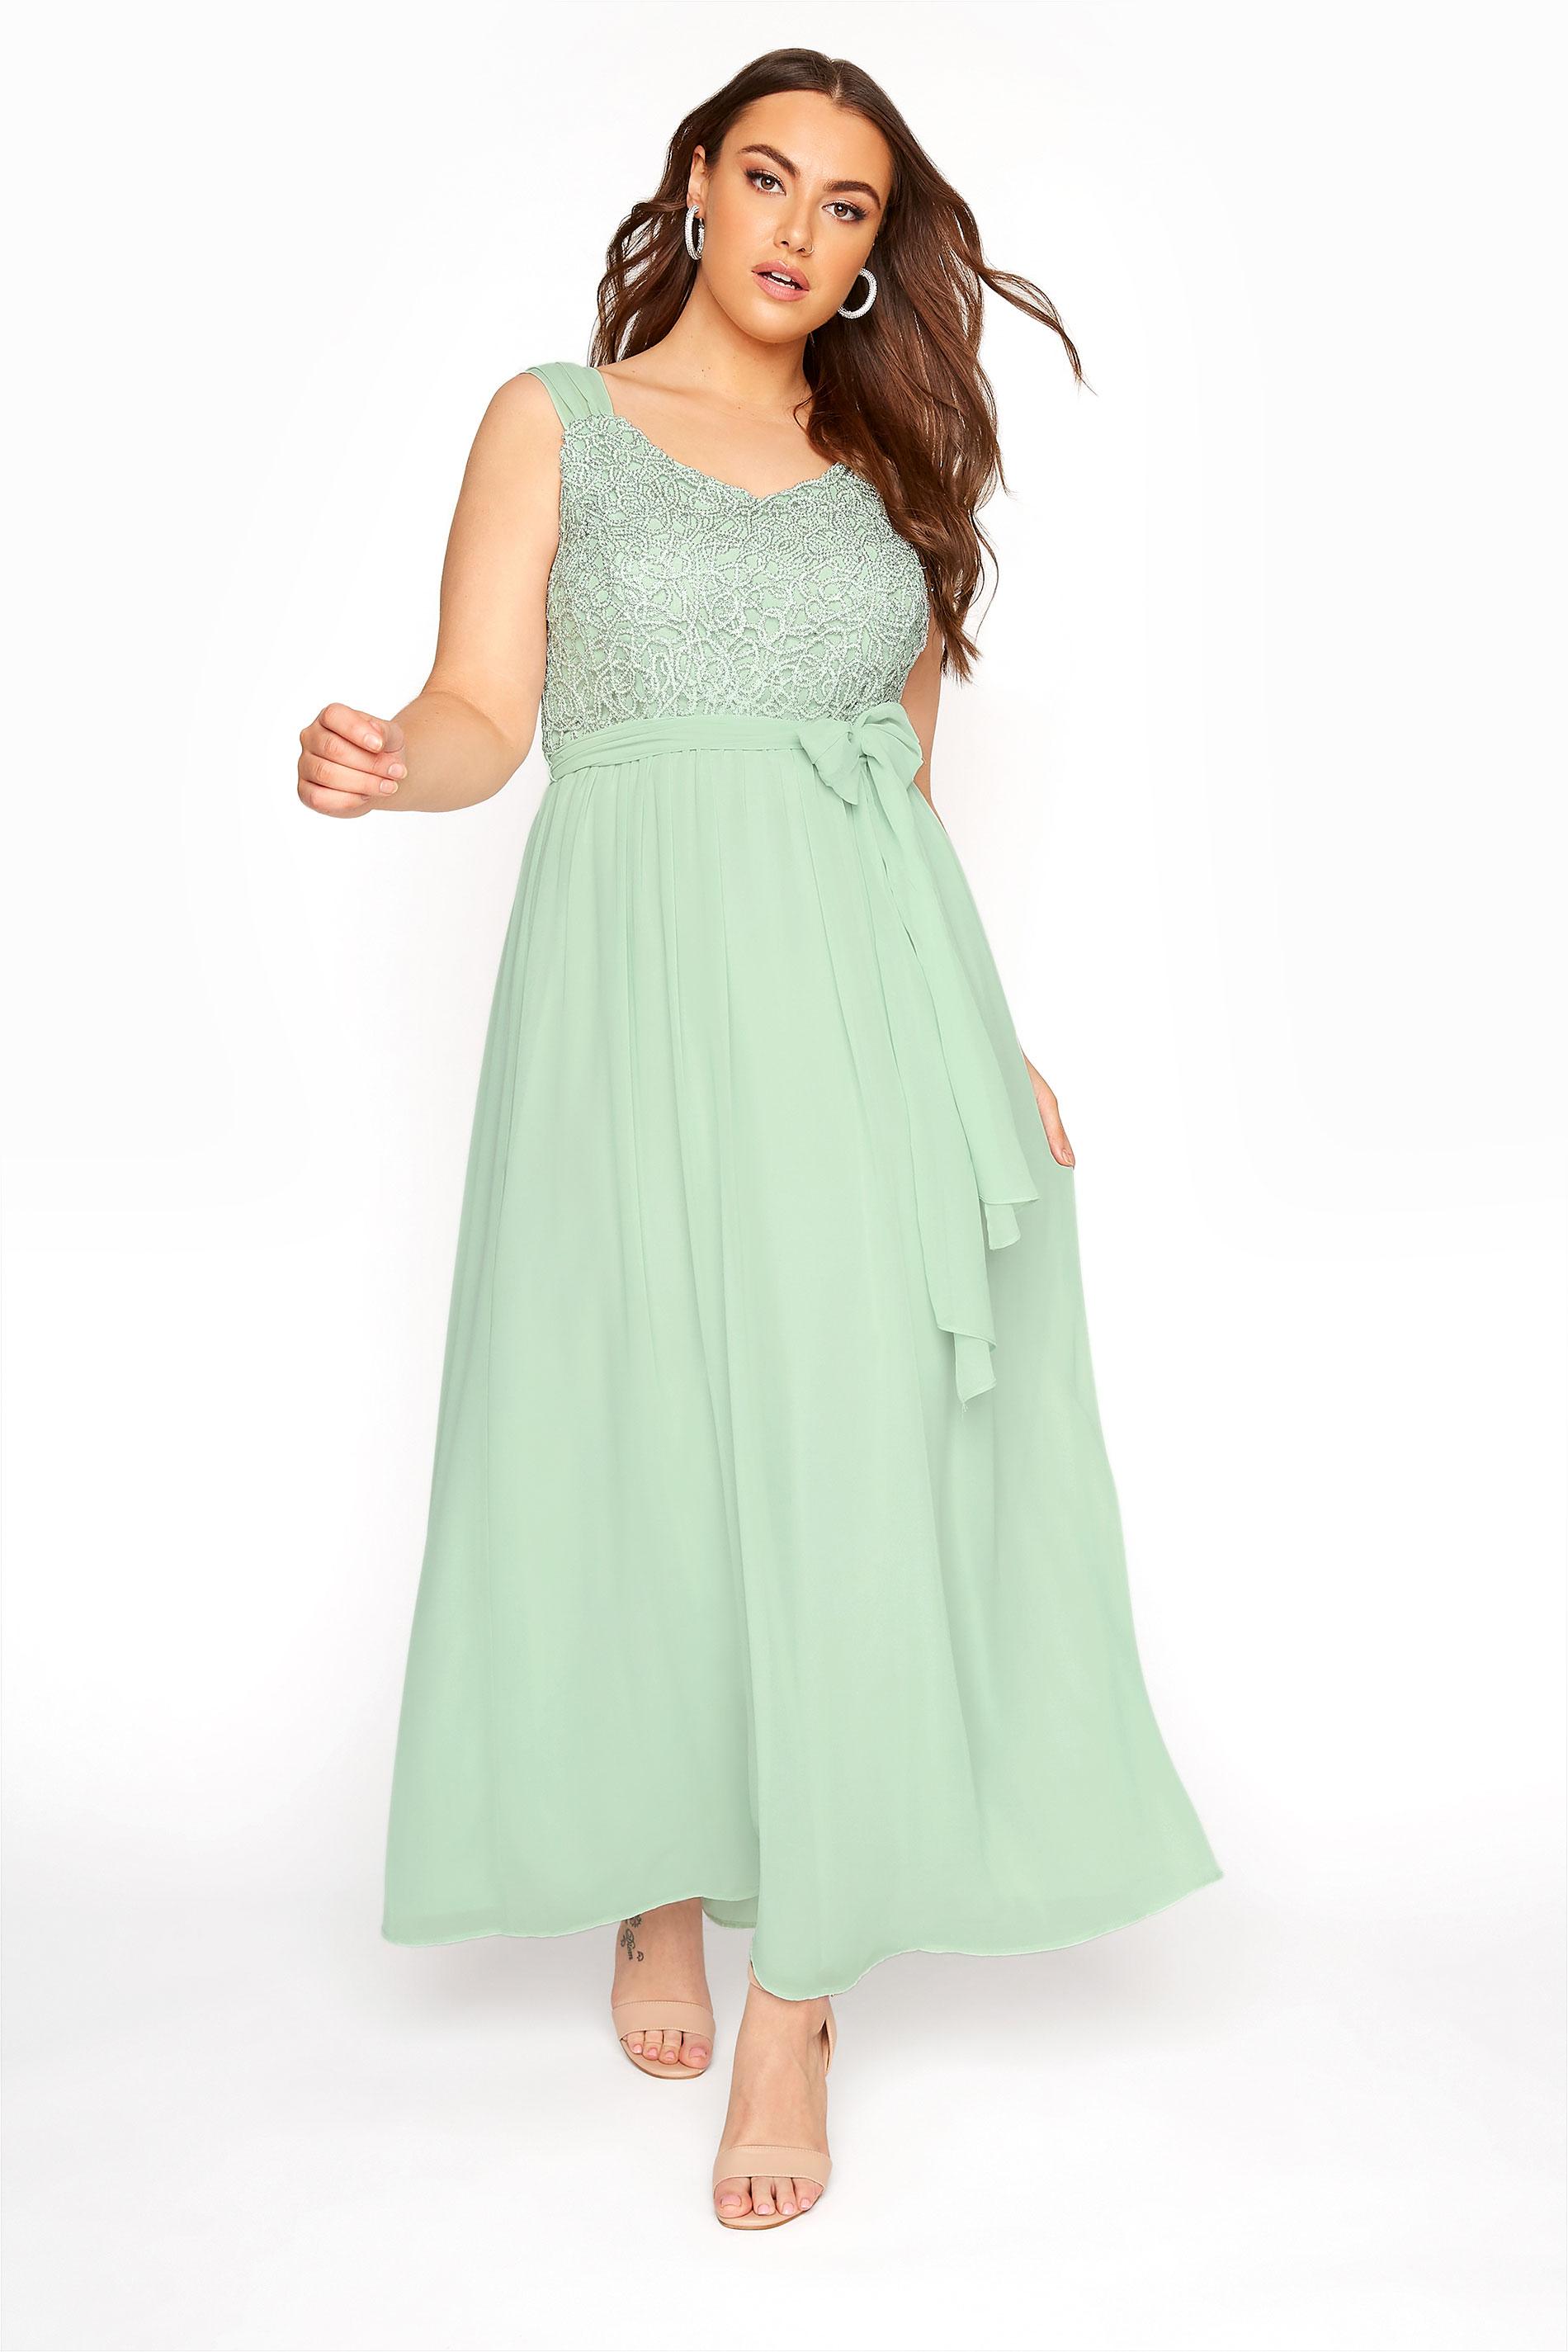 Mint Sleeveless Crochet Overlay Maxi Dress